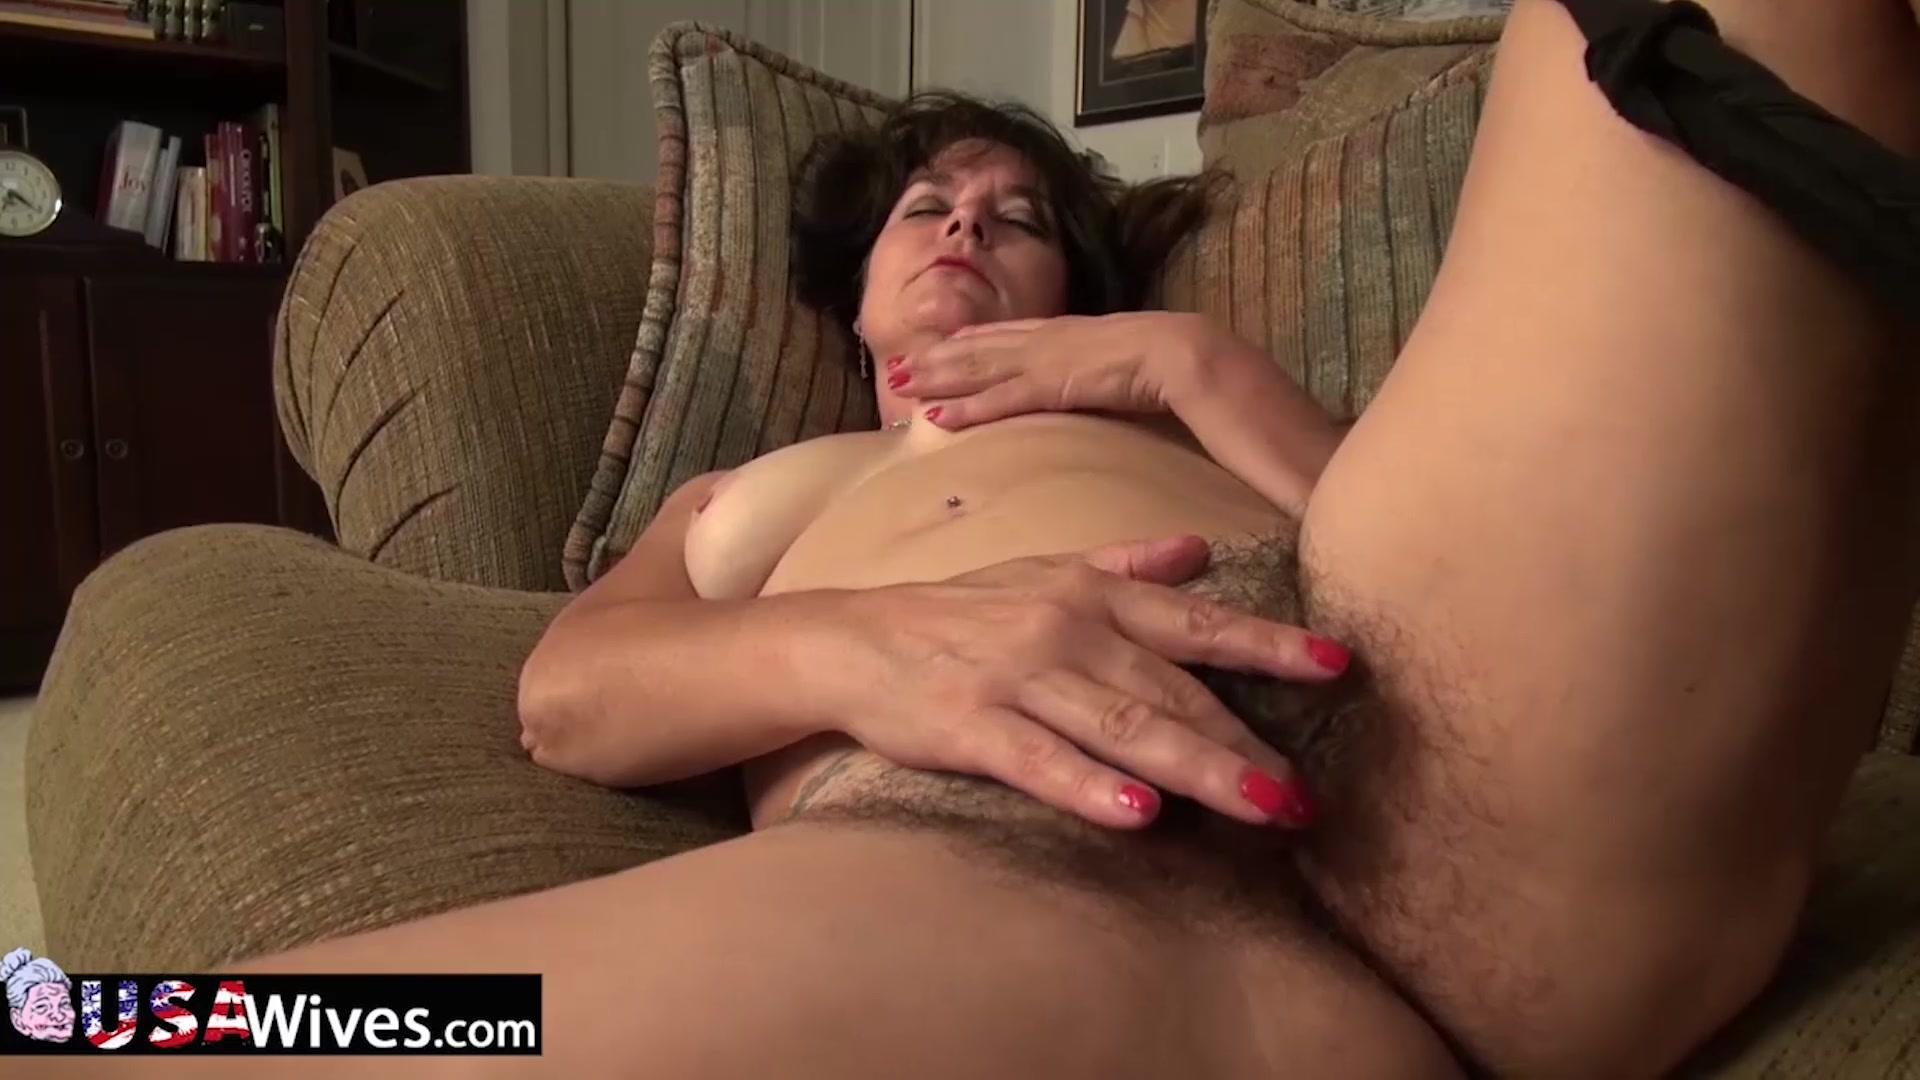 Sexy por pics Adult behavior change positive reinforcement